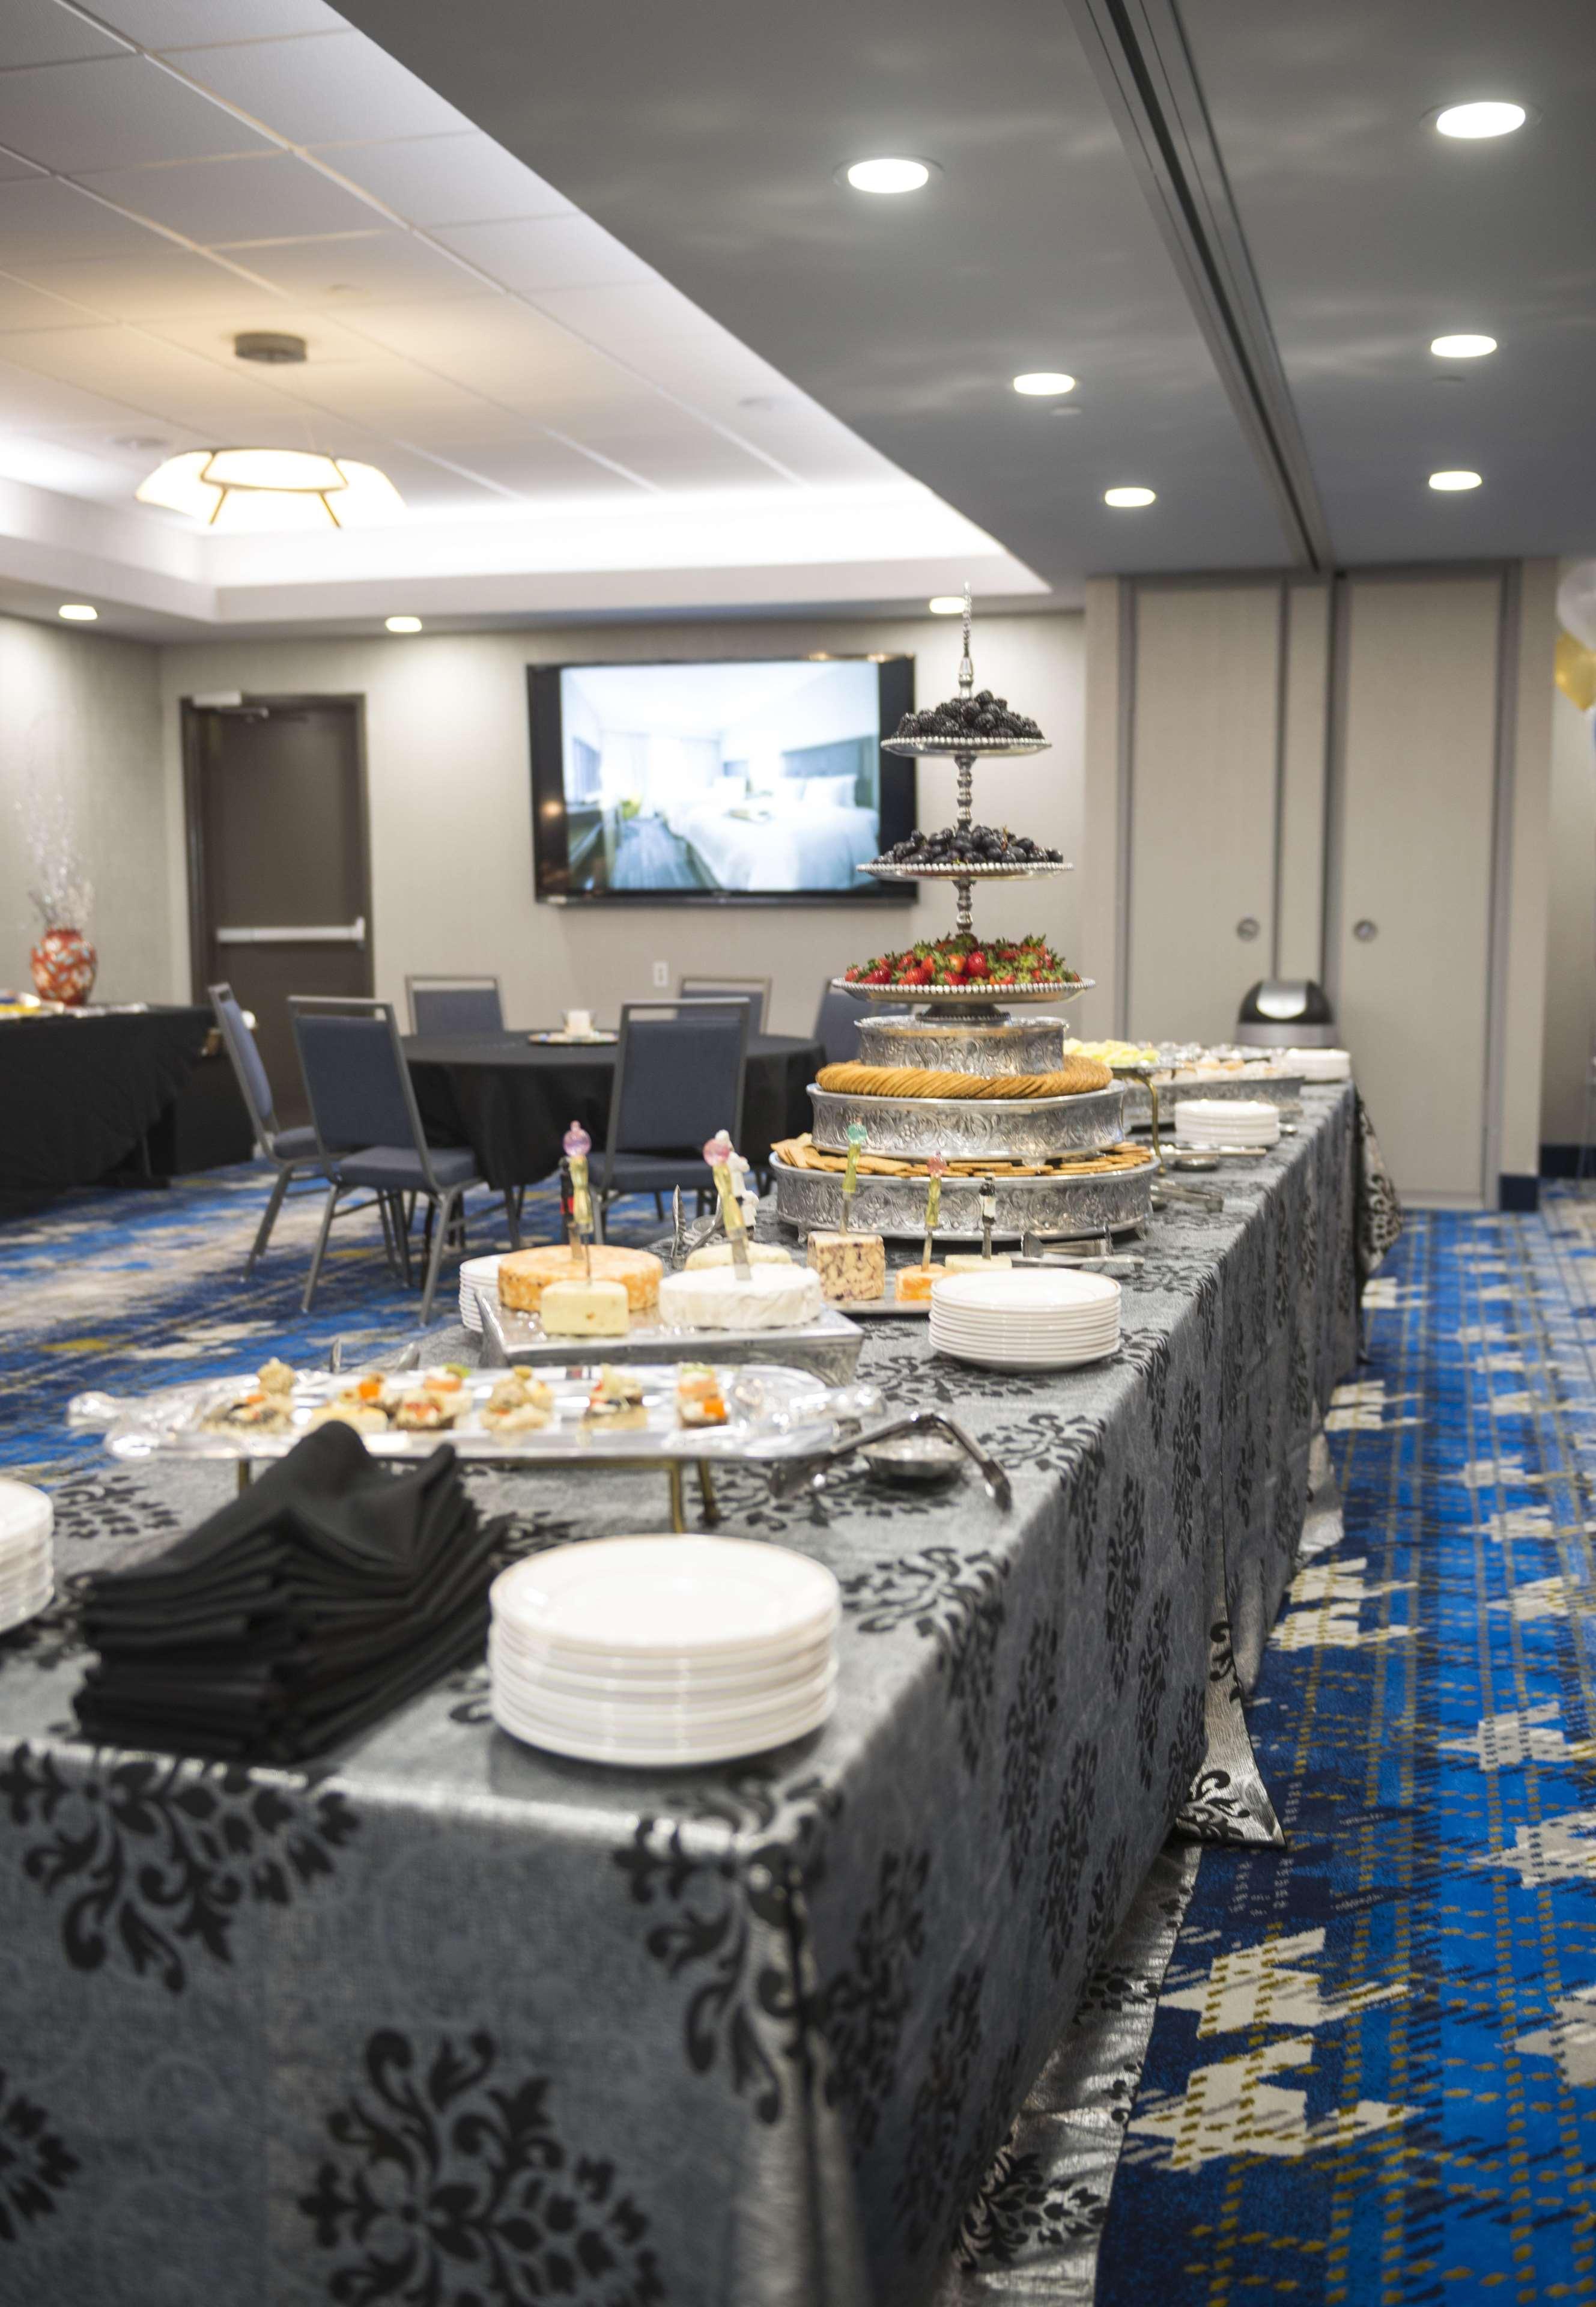 Hampton Inn & Suites Dallas/Ft. Worth Airport South image 36